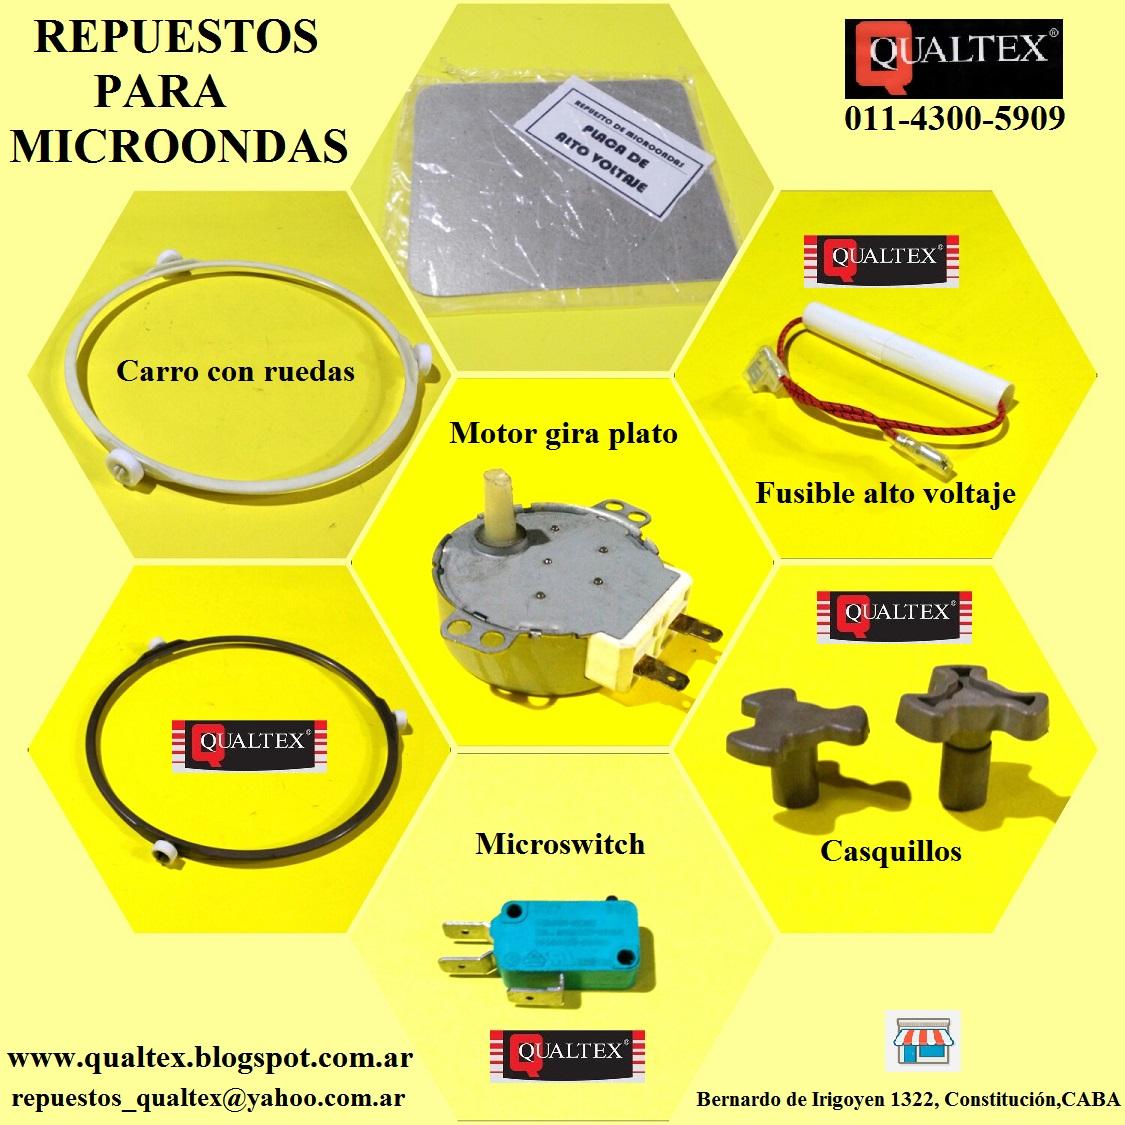 Qualtex arg repuestos para electrodom sticos repuestos for Repuestos y accesorios para toldos